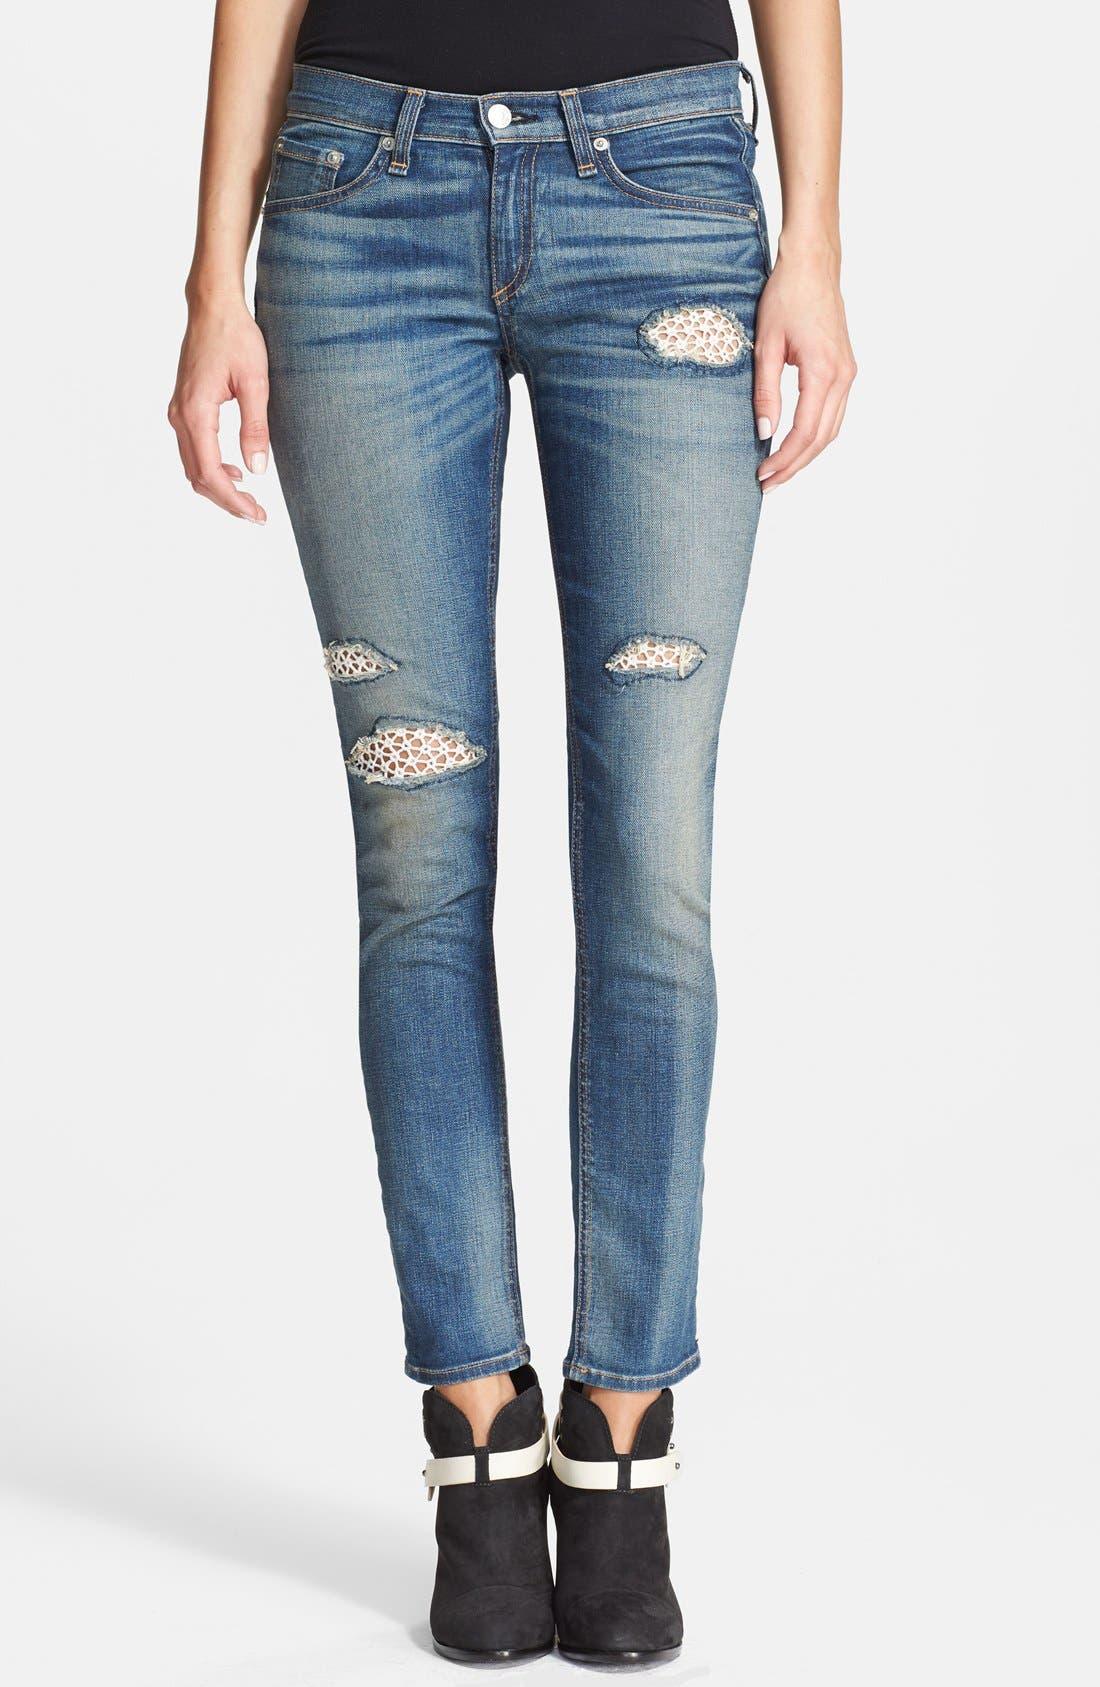 Main Image - rag & bone/JEAN Stretch Skinny Jeans (Crochet Lace)